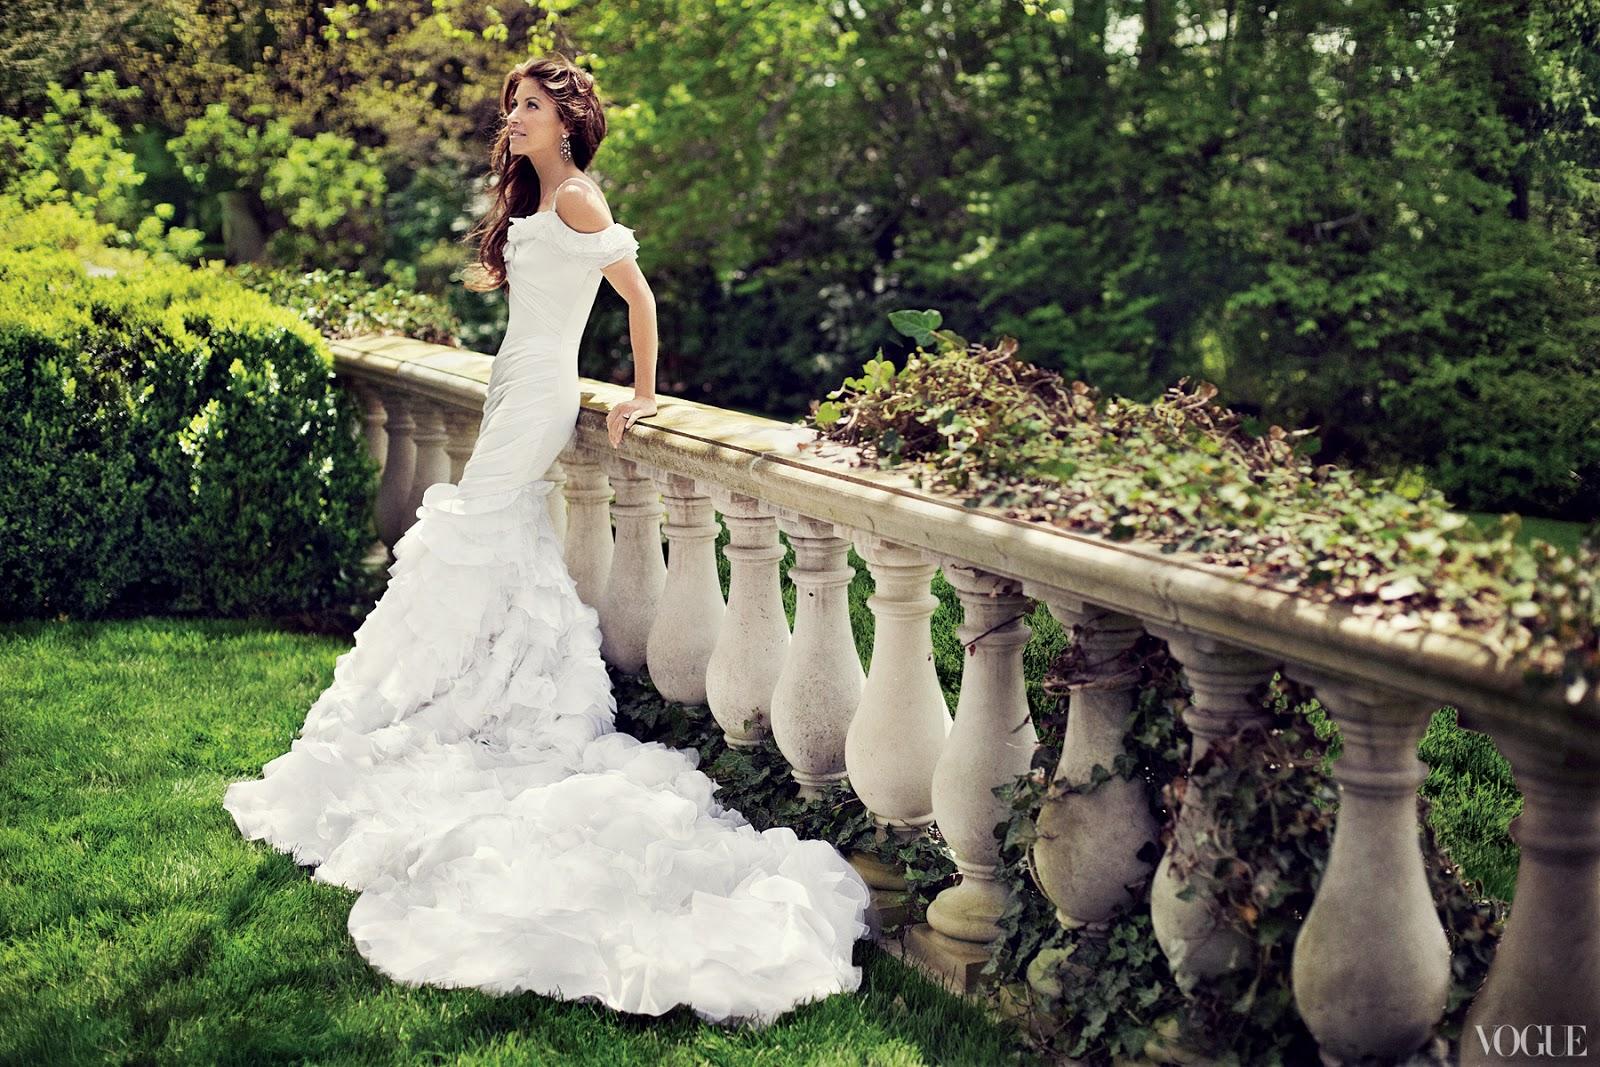 In good taste vogue weddings monday june 24 2013 junglespirit Image collections